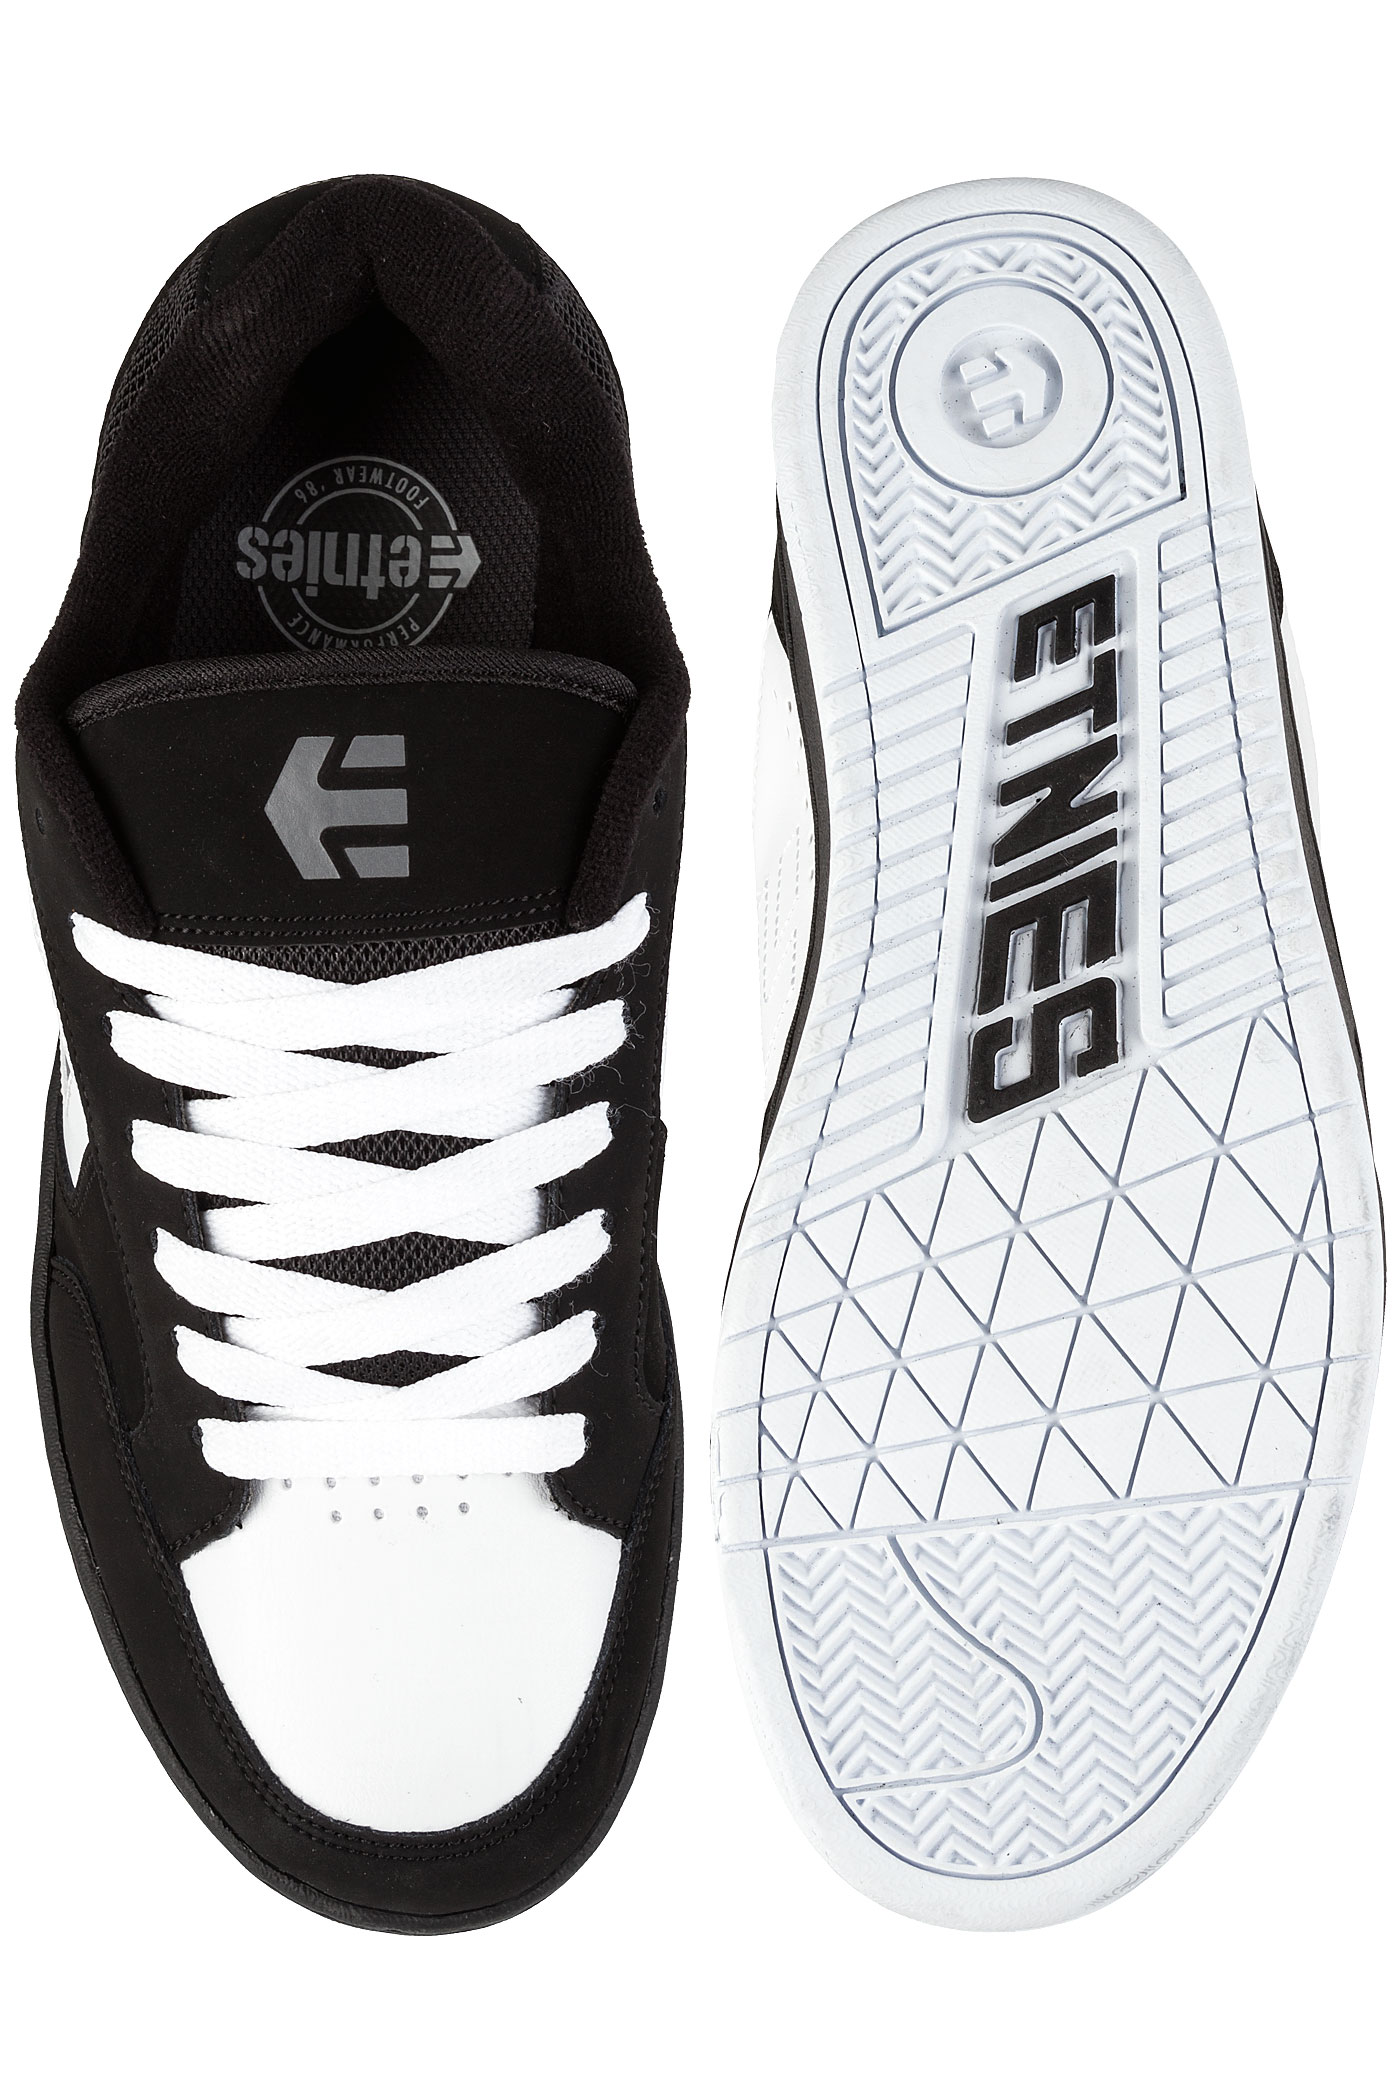 Grey Swivel Swivel White Chaussureblack White Etnies Chaussureblack Etnies wON8n0PkXZ